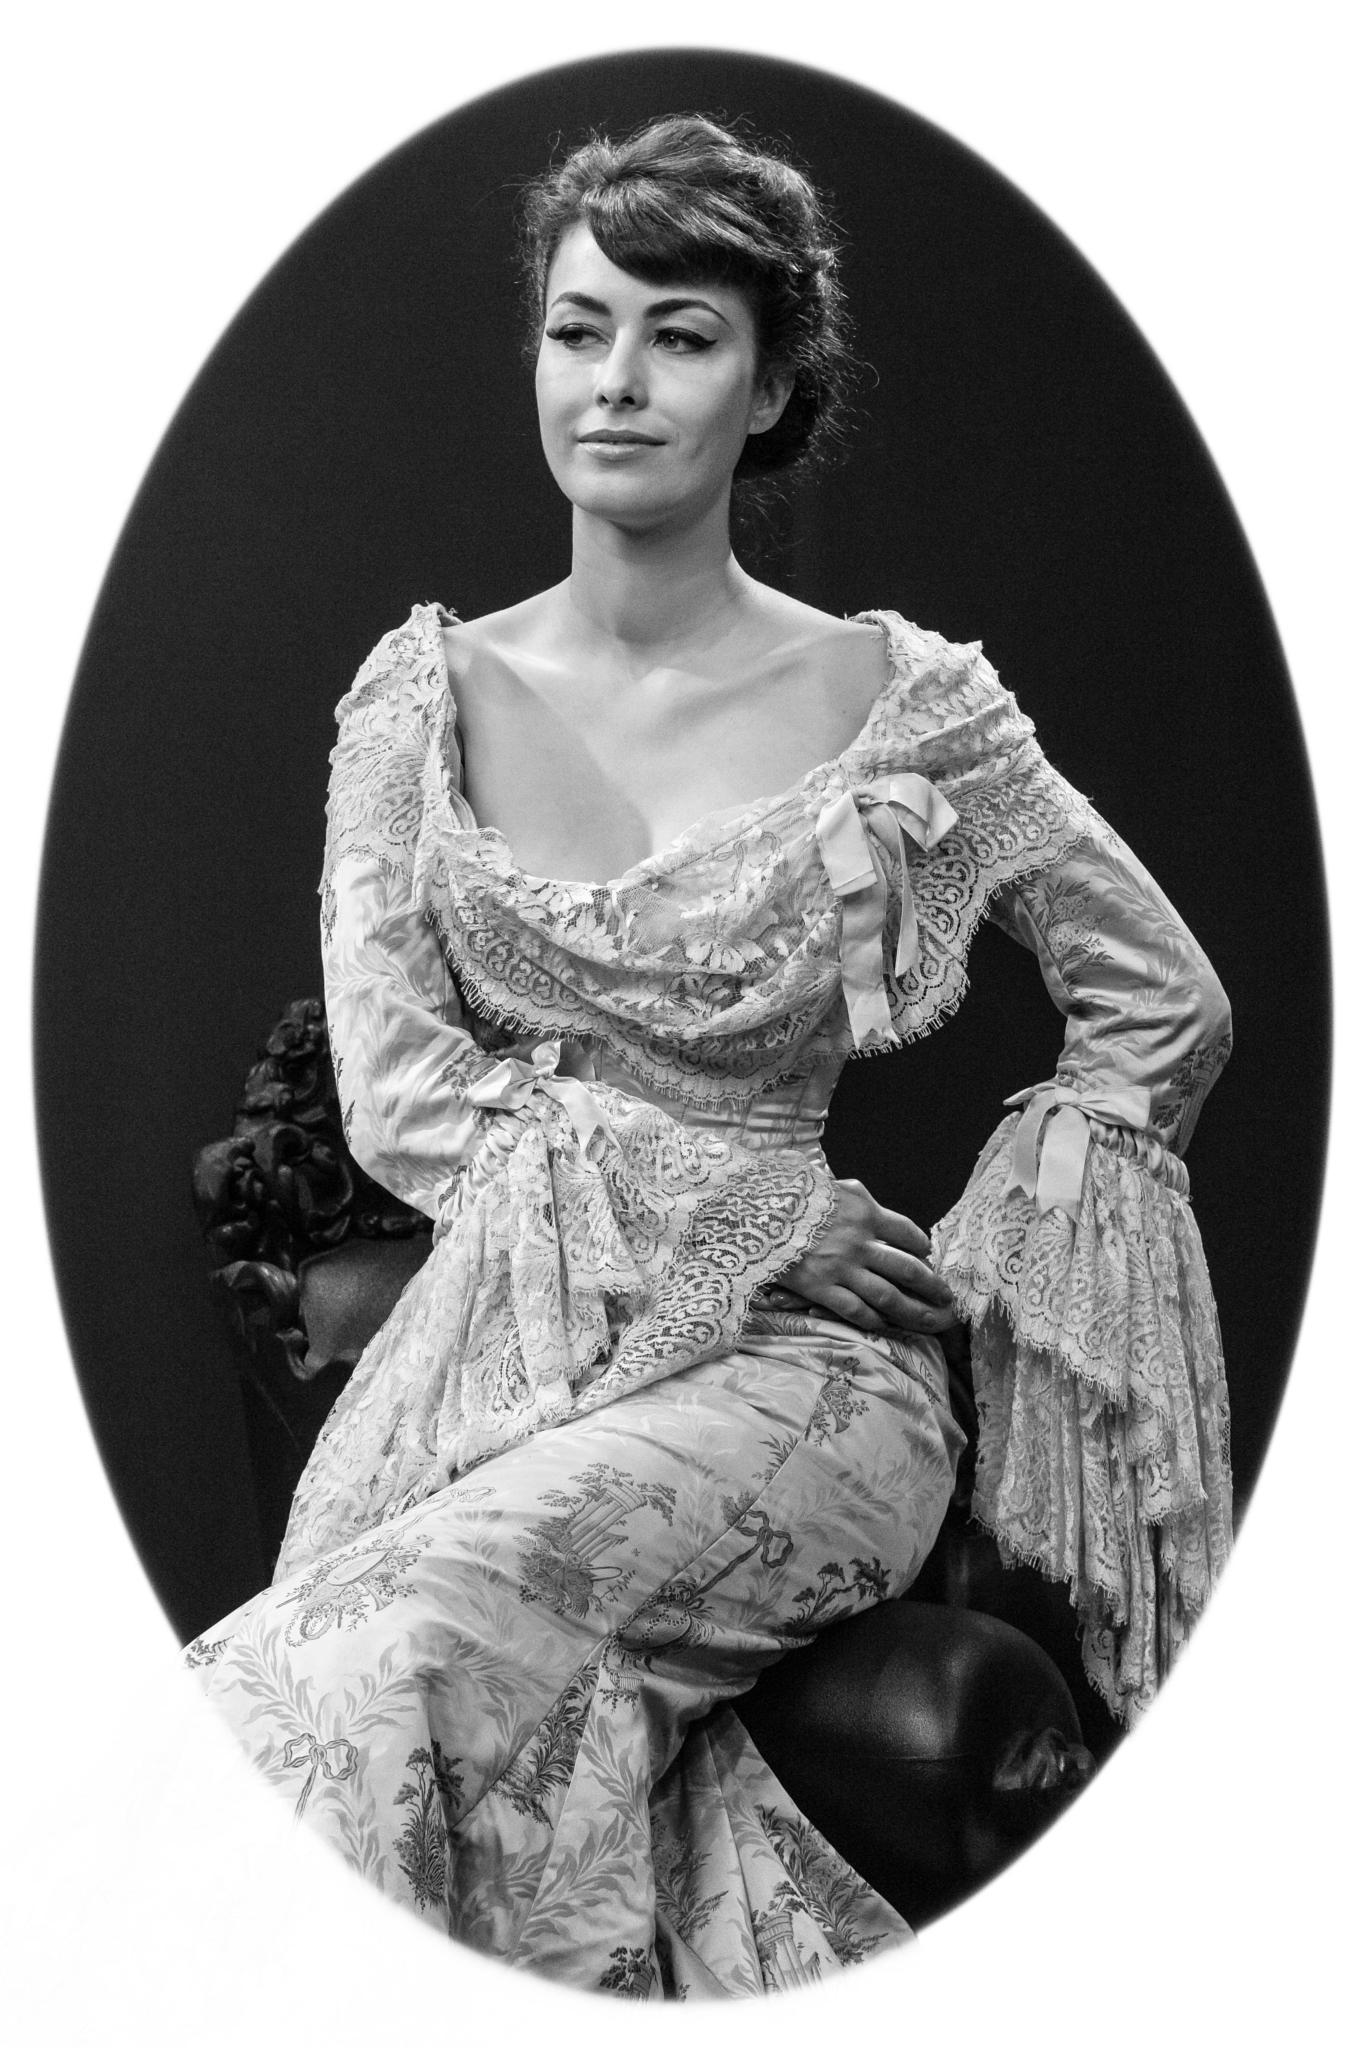 Princess Emilly Retro 2 by Paulus Charles